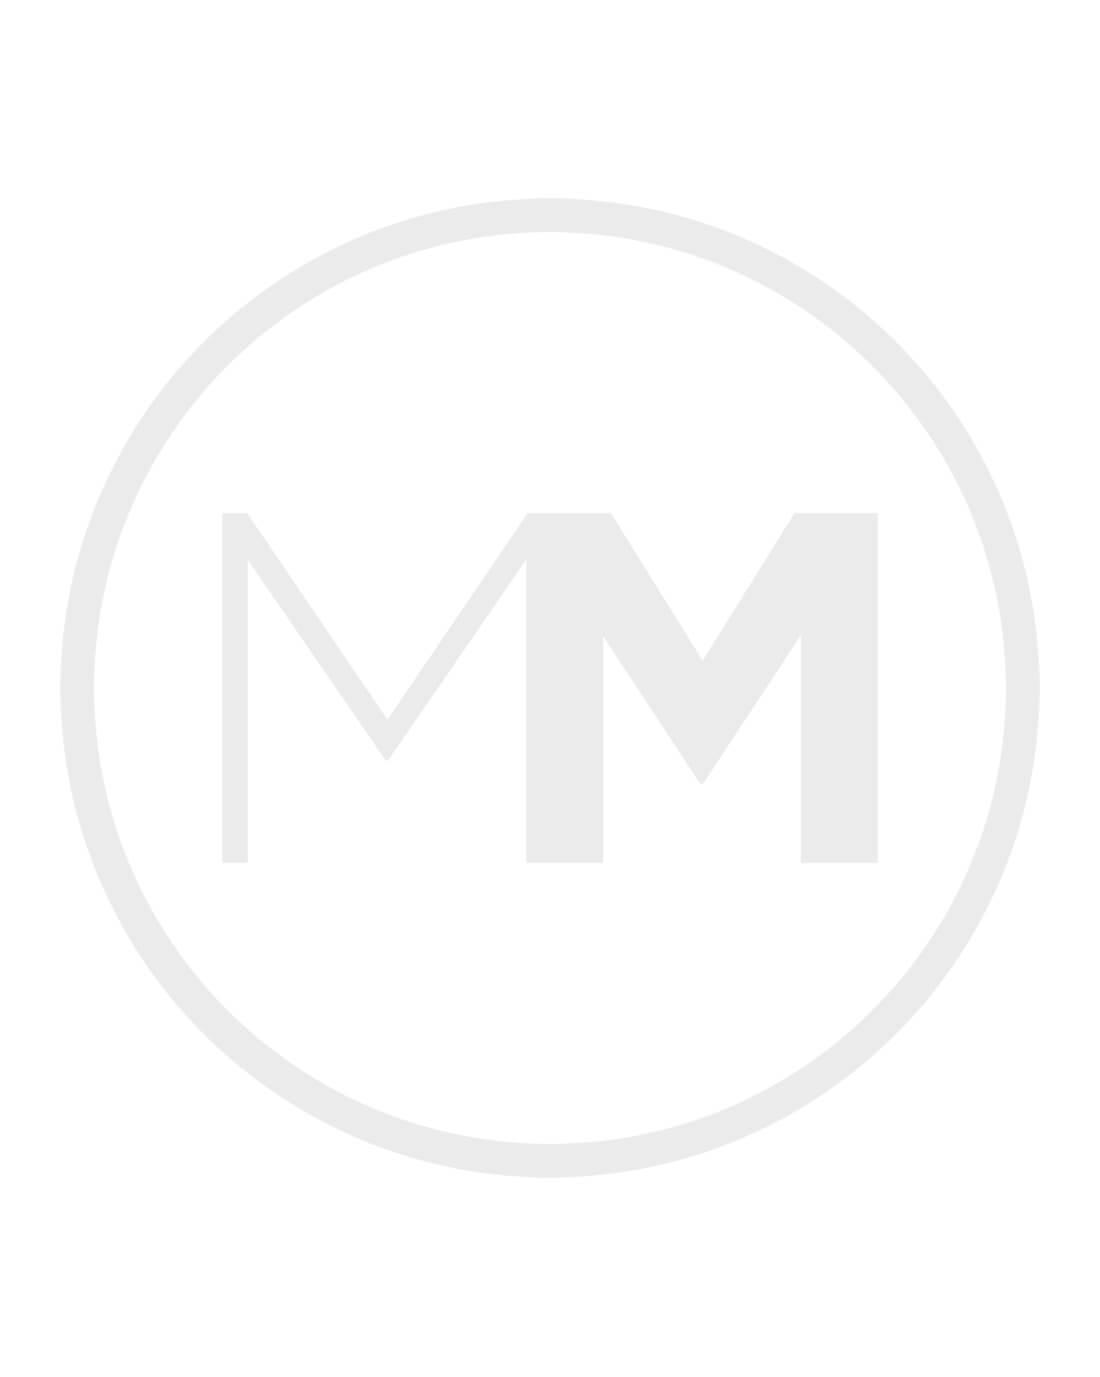 Expresso Marion Pullover grijs dessin